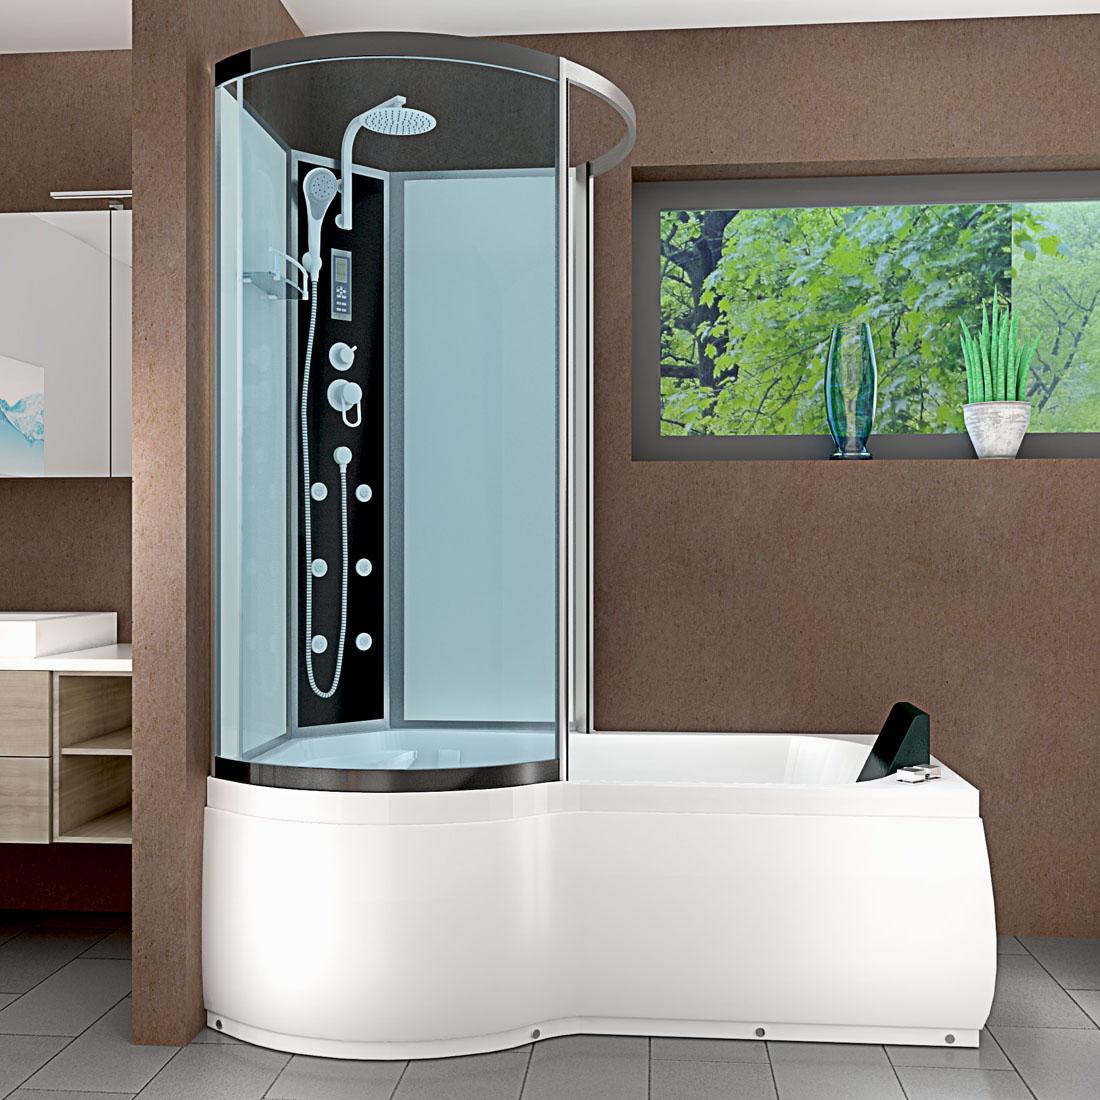 acquavapore dtp8050 a003r whirlpool wanne duschtempel dusche duschkabine 98x170. Black Bedroom Furniture Sets. Home Design Ideas